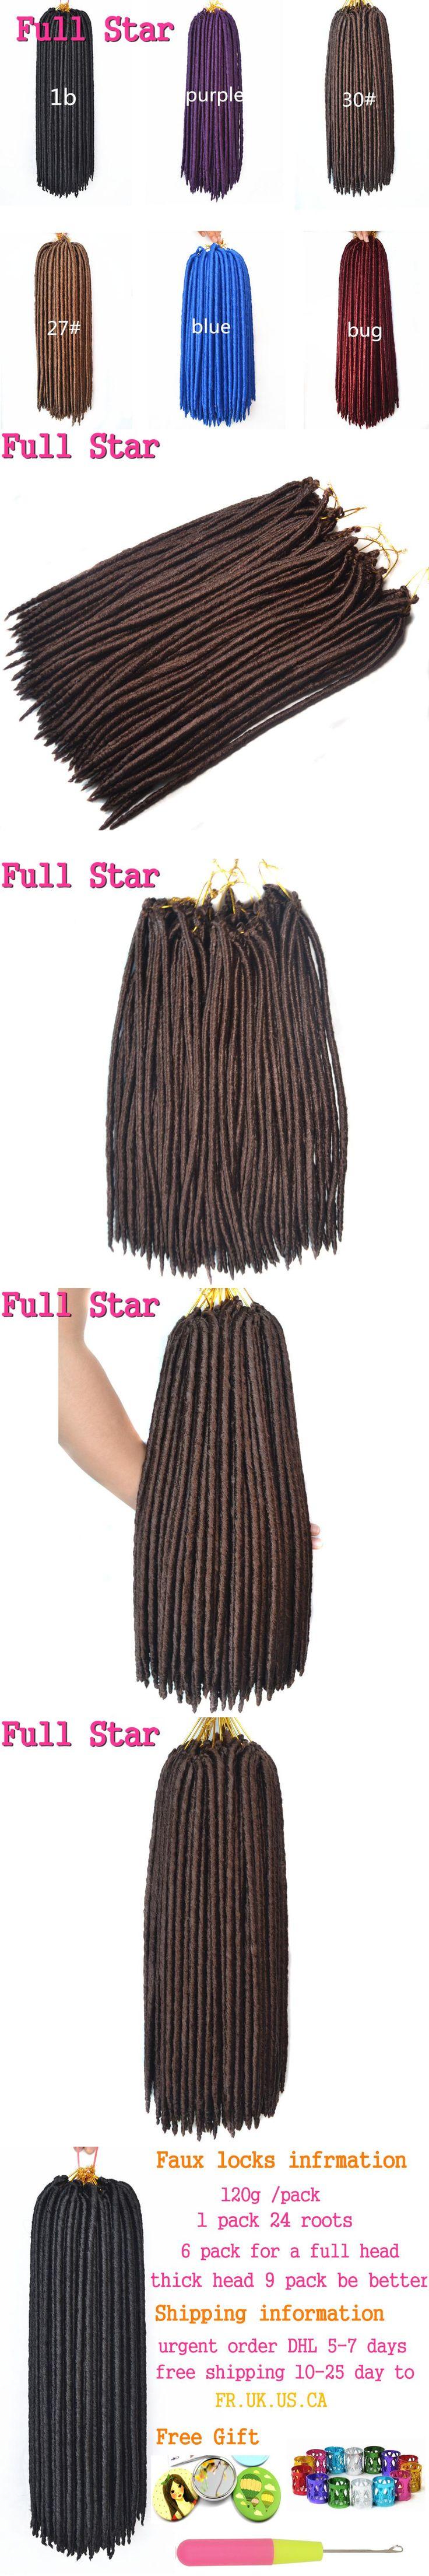 "Full Star 1pcs 24 Strands 18"" 14"" Crochet Braids Hair High Temperature Fiber synthetic Black Purple Bug Crochet dreadlocks hair"